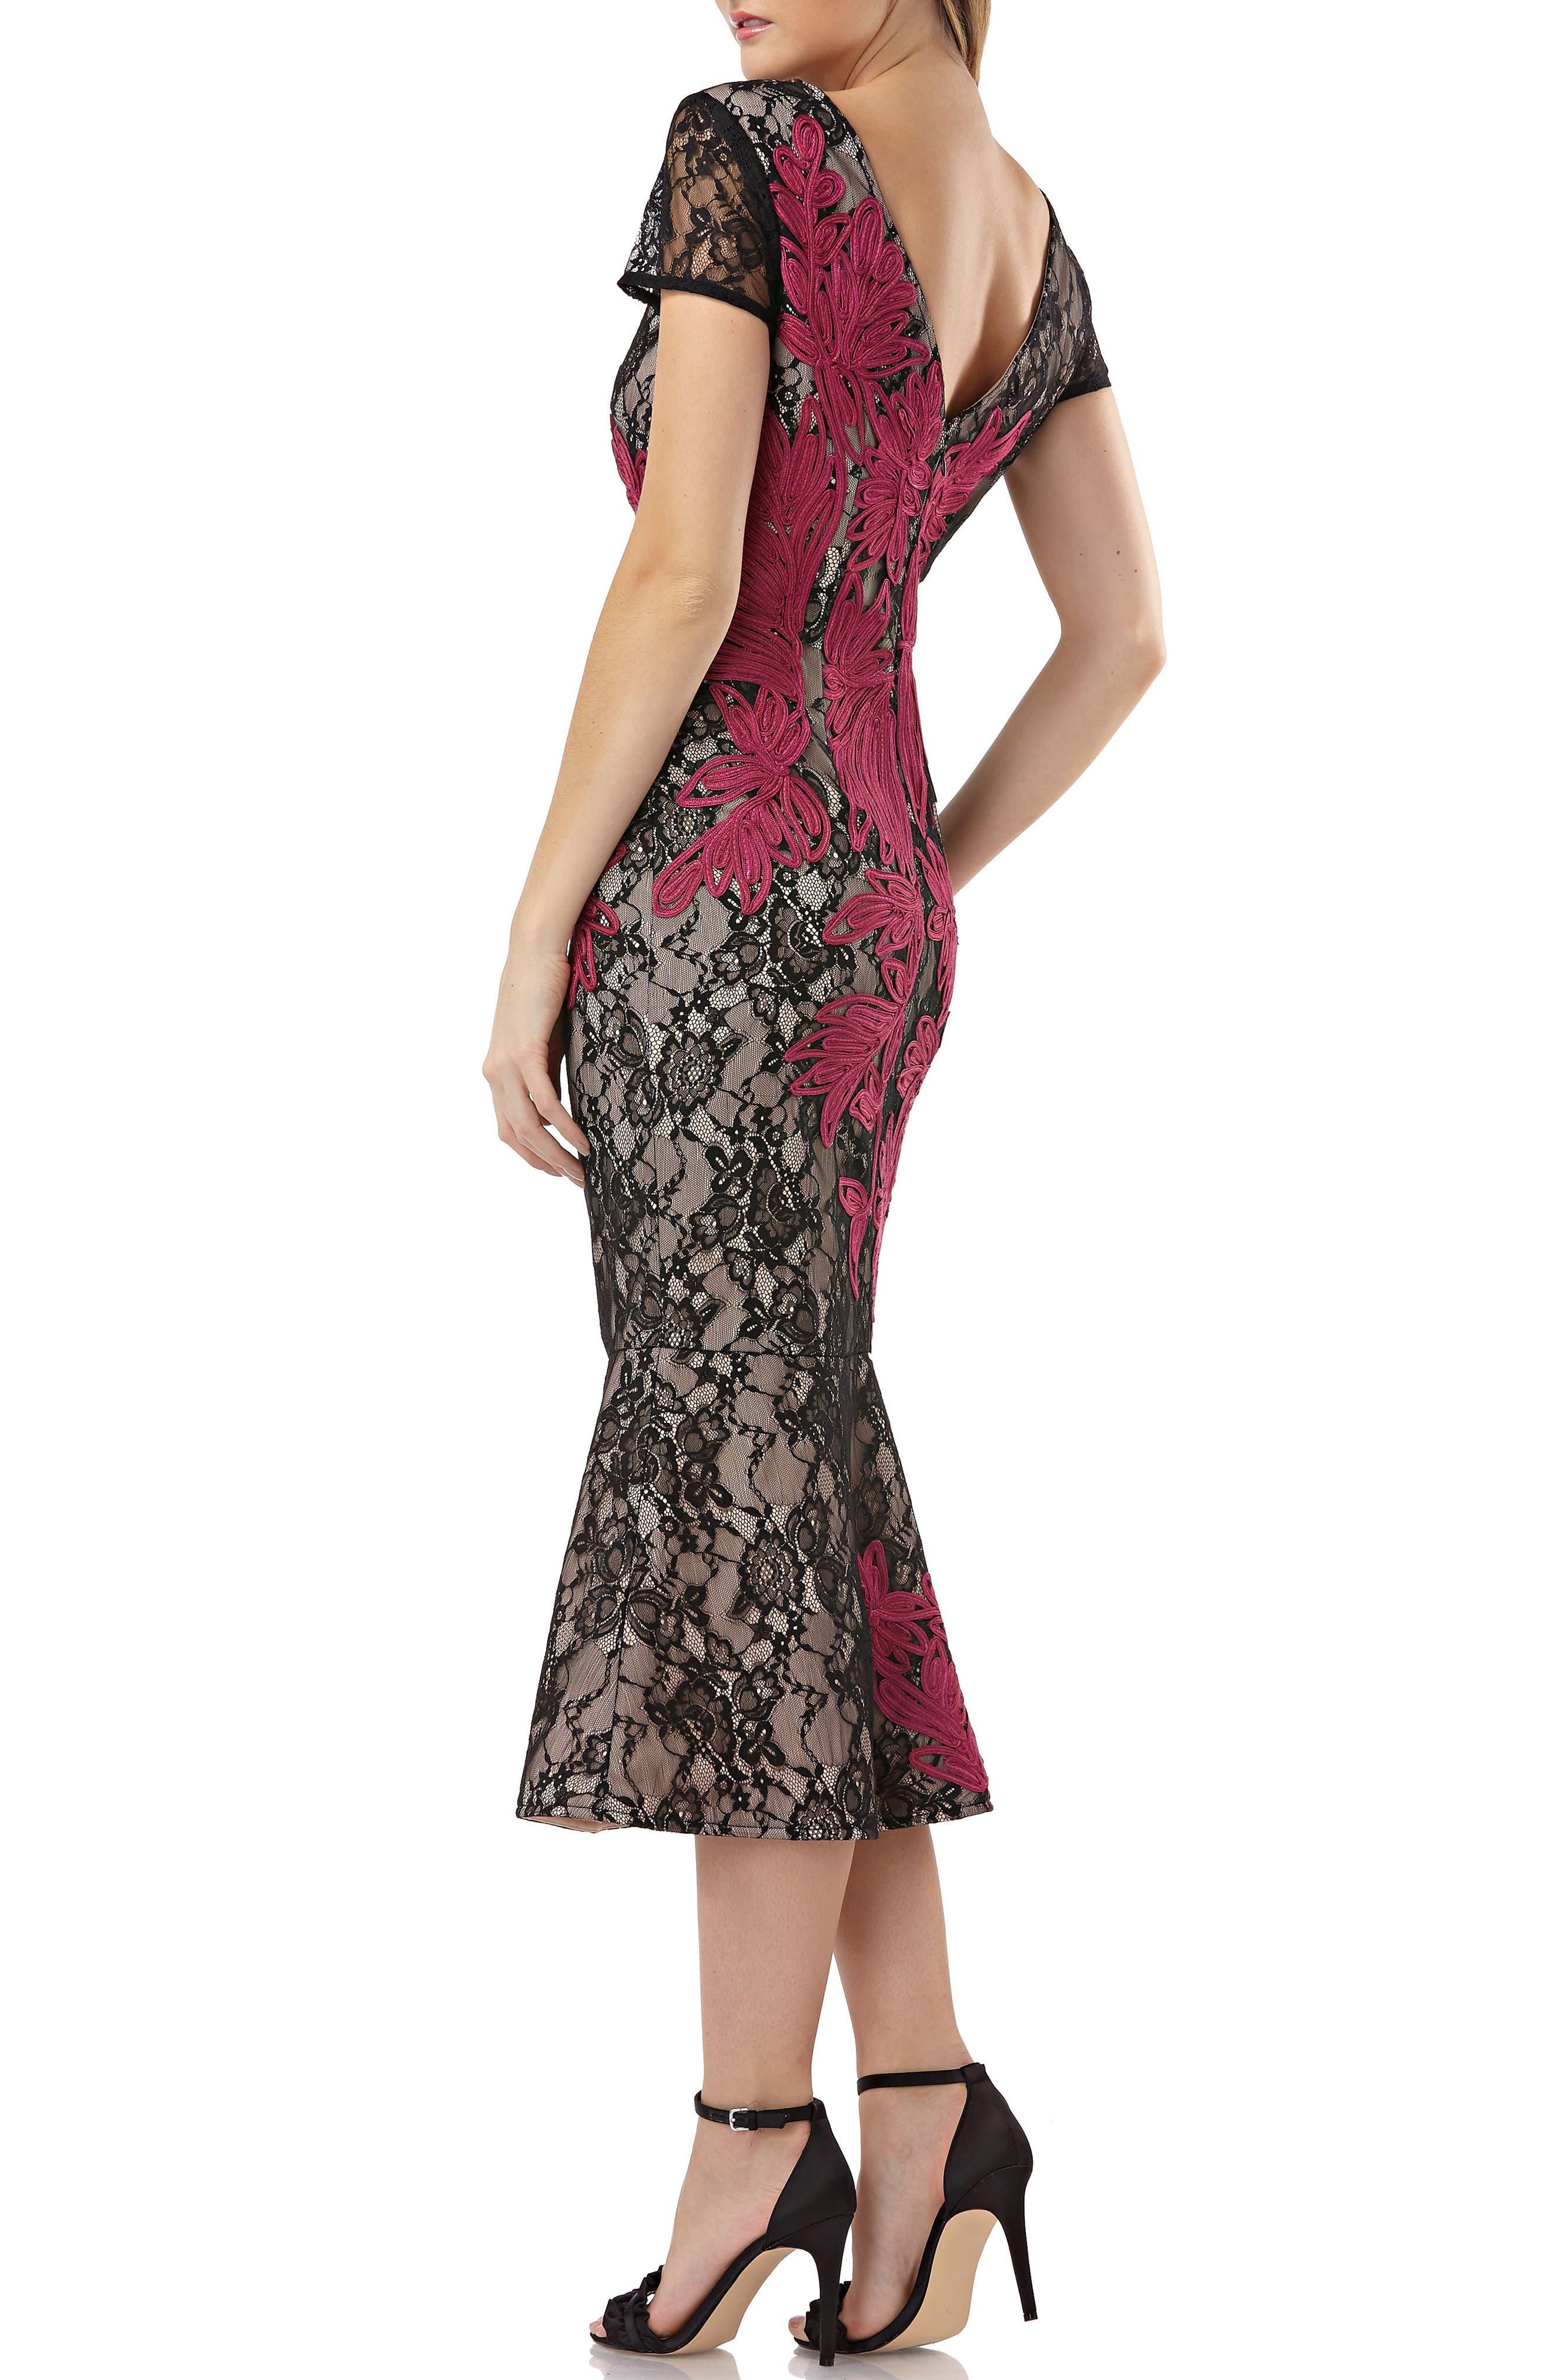 JS COLLECTIONS, Soutache Embroidered Lace Dress, Alternate thumbnail 2, color, BLACK/ MAGENTA